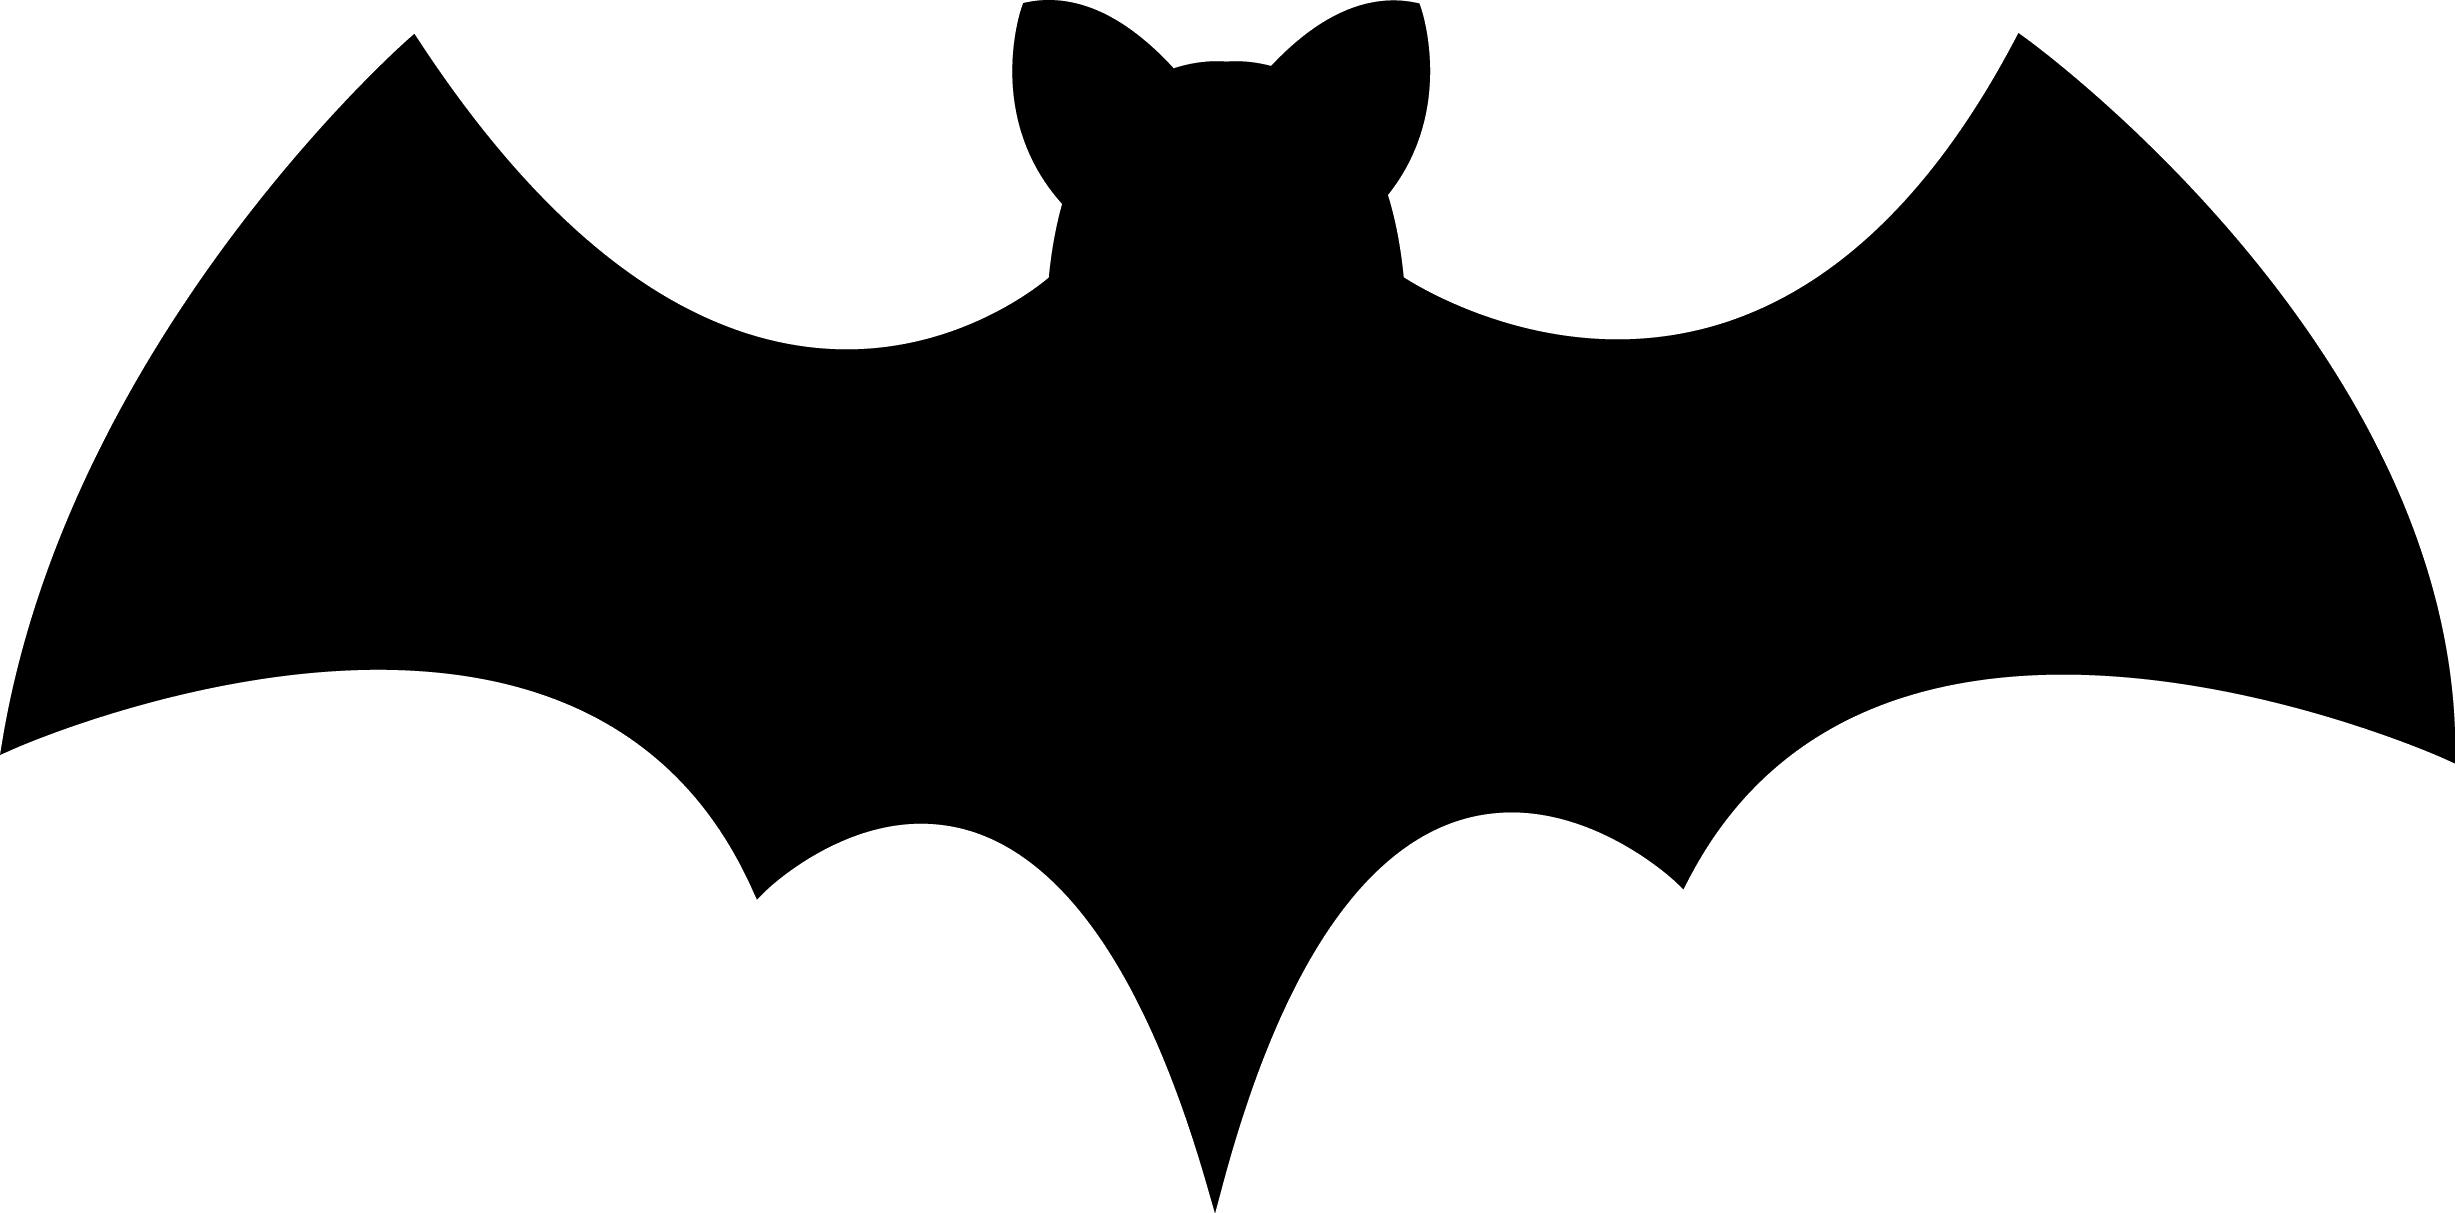 Bat silhouette clipart pumpkin svg stock Bat PNG Transparent Free Images | PNG Only svg stock